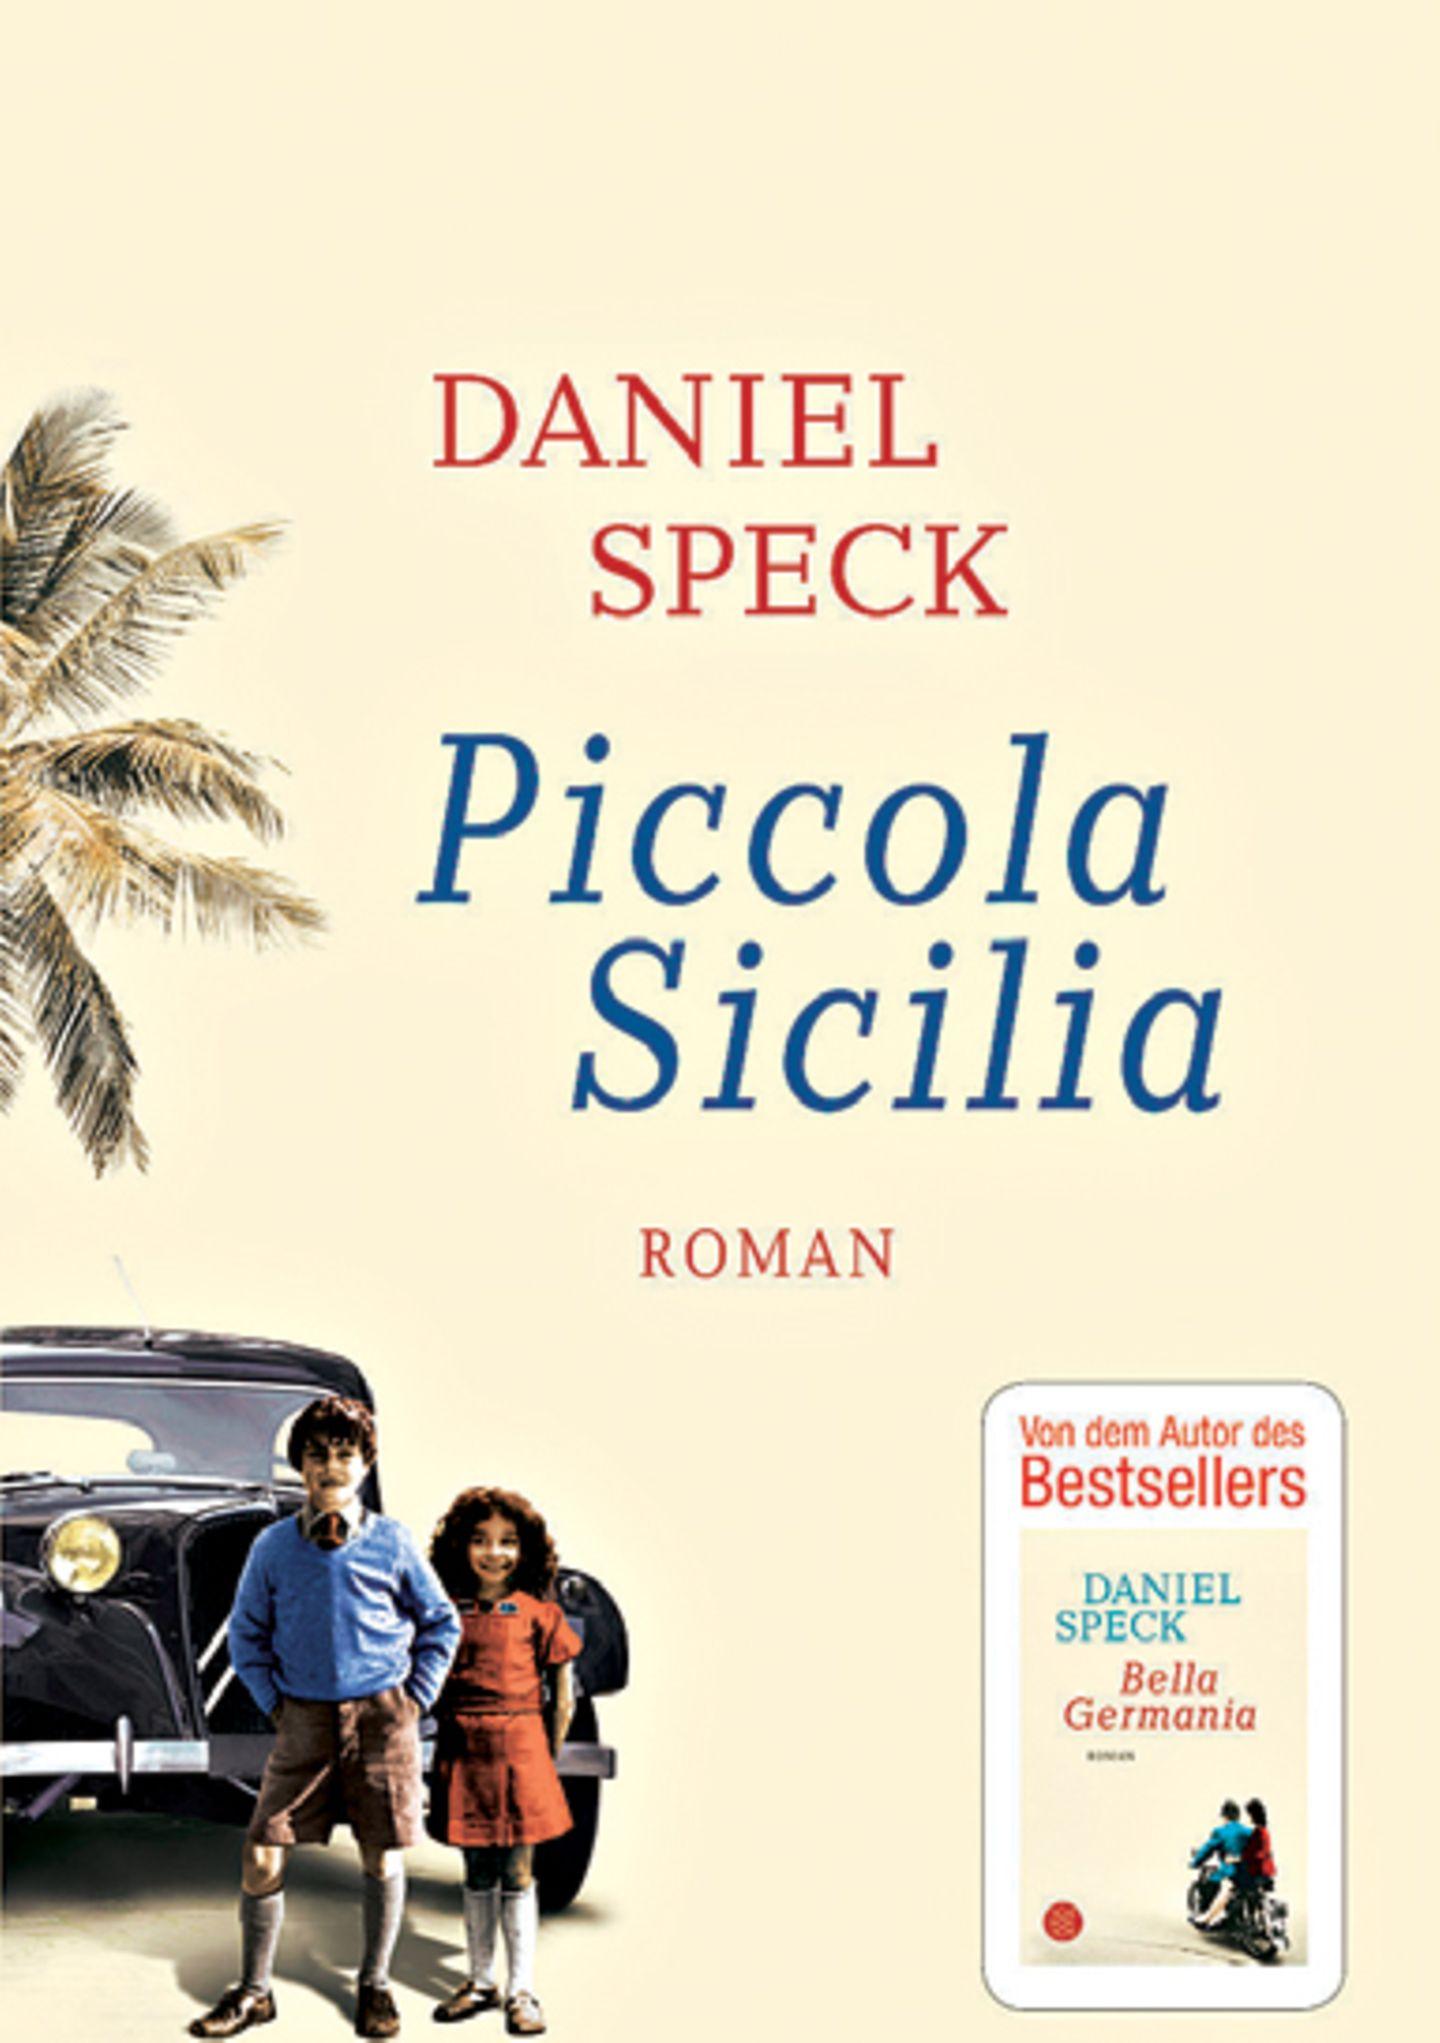 Literaturempfehlung: Piccola Sicilia